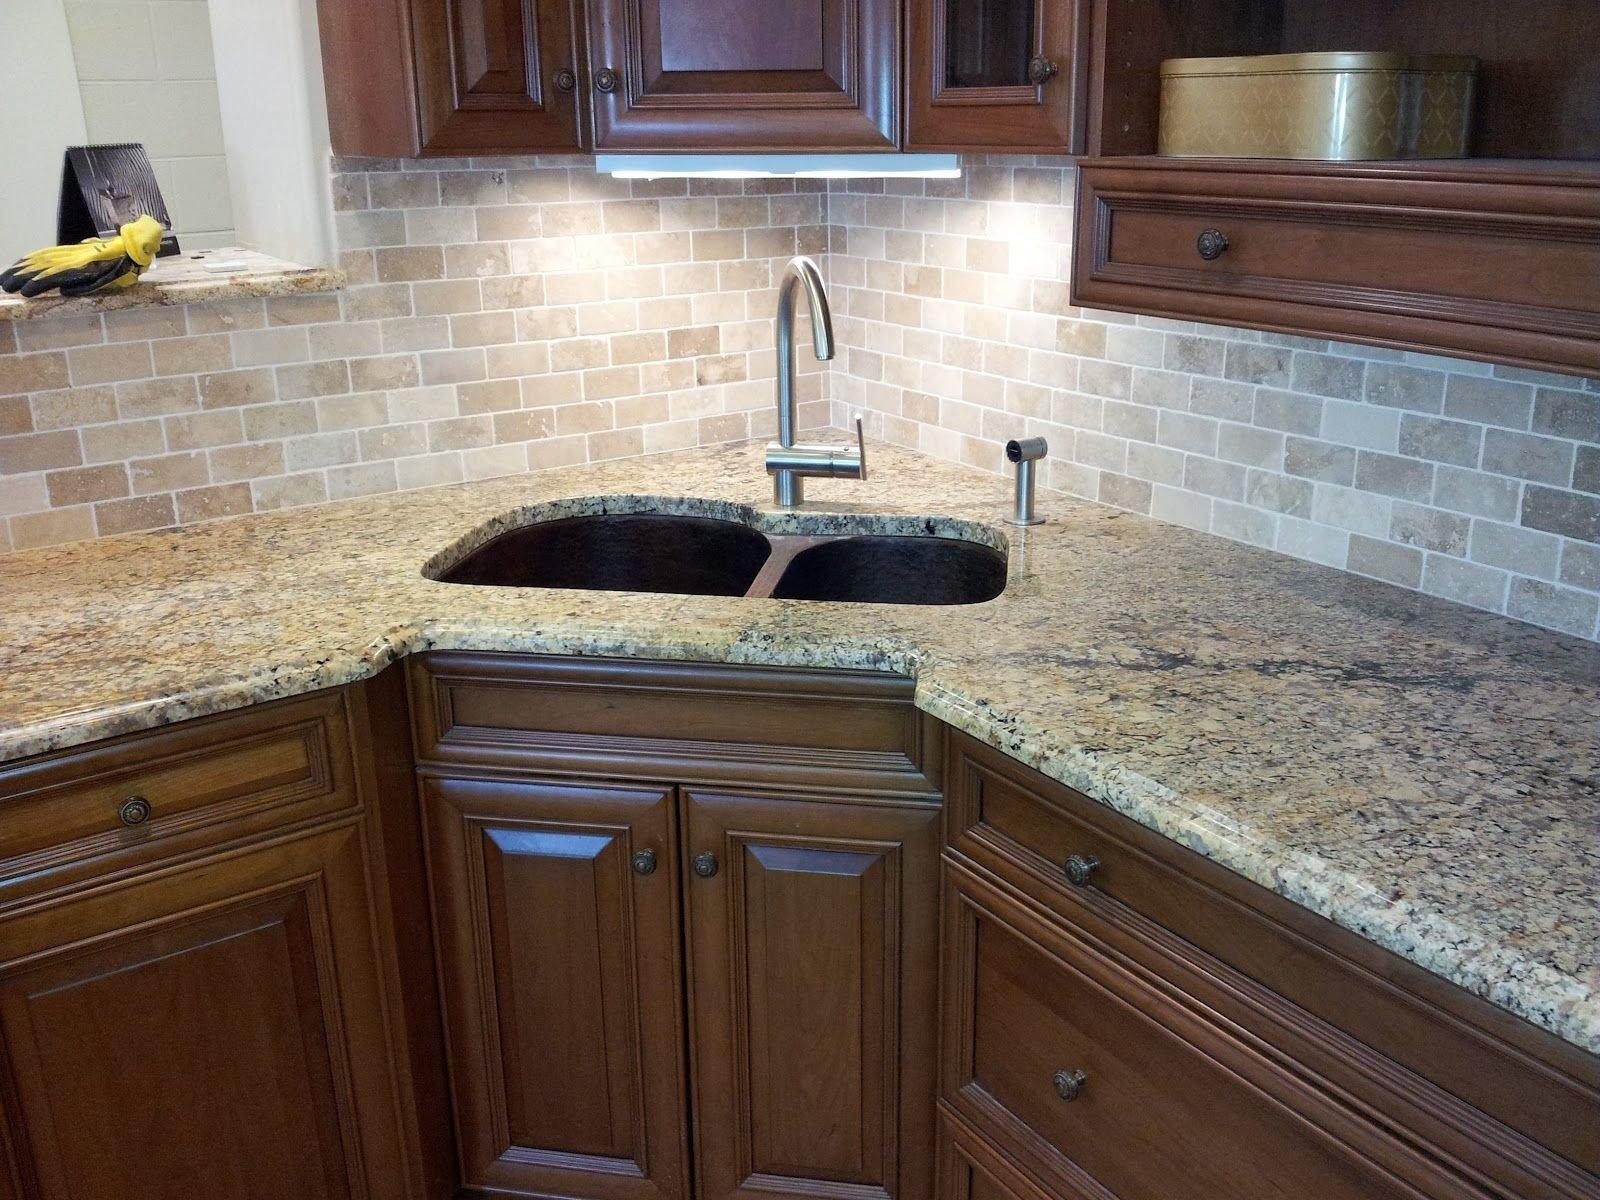 10 Gorgeous Ideas For Kitchen Backsplash With Granite Countertops tile backsplashes with granite countertops tile backsplash and 2020